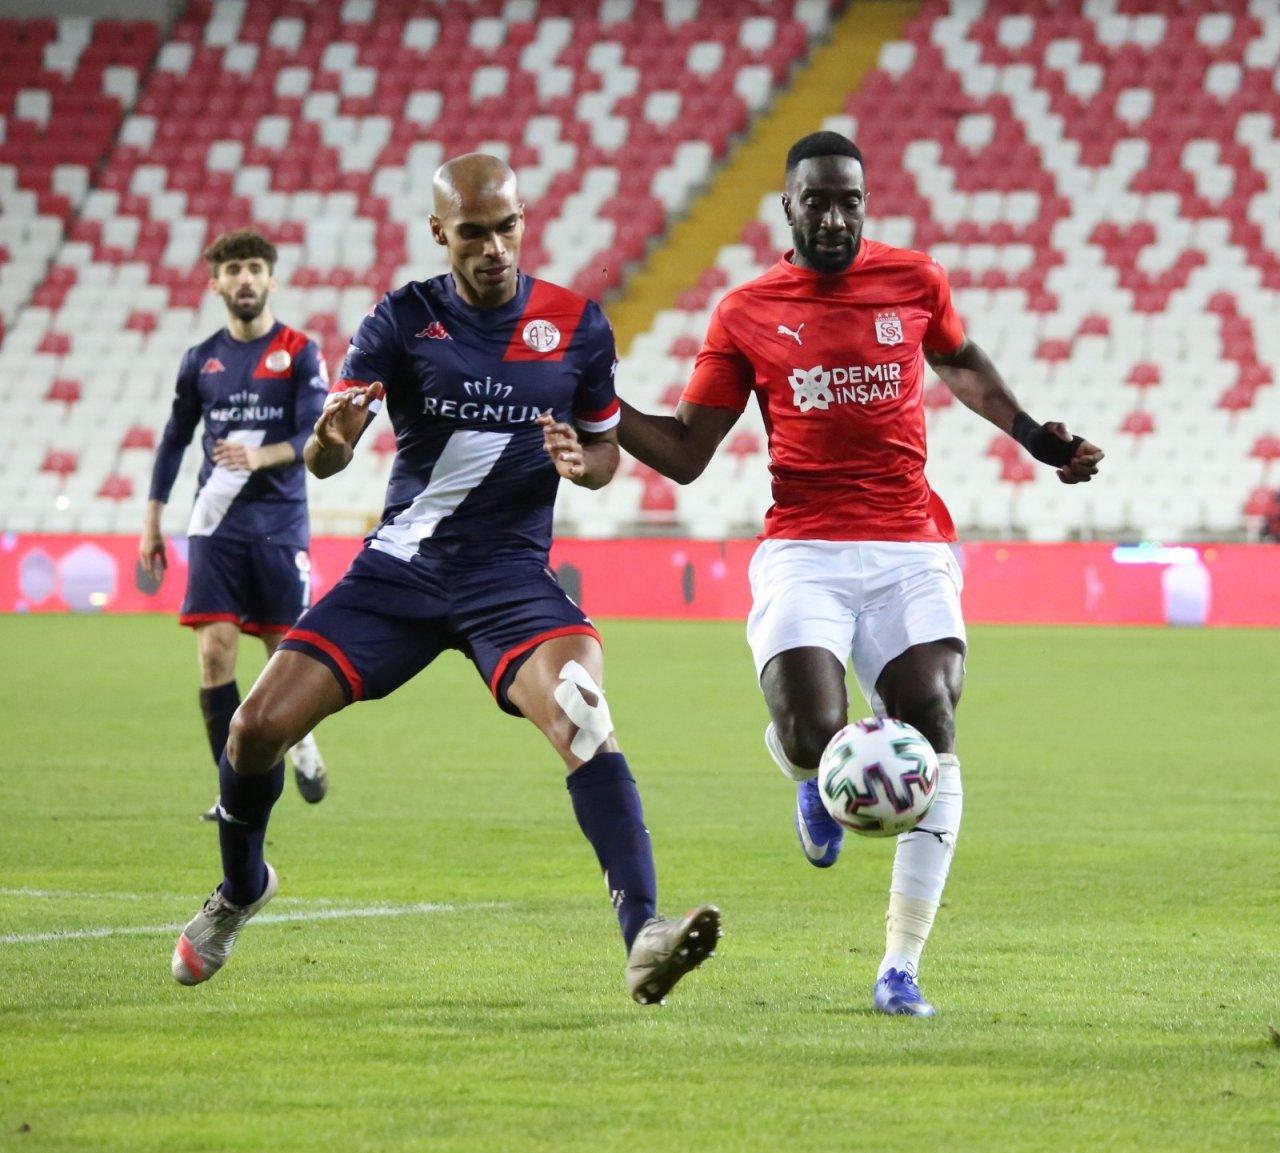 Ft Antalyaspor İle Dg Sivasspor 35. Randevuda